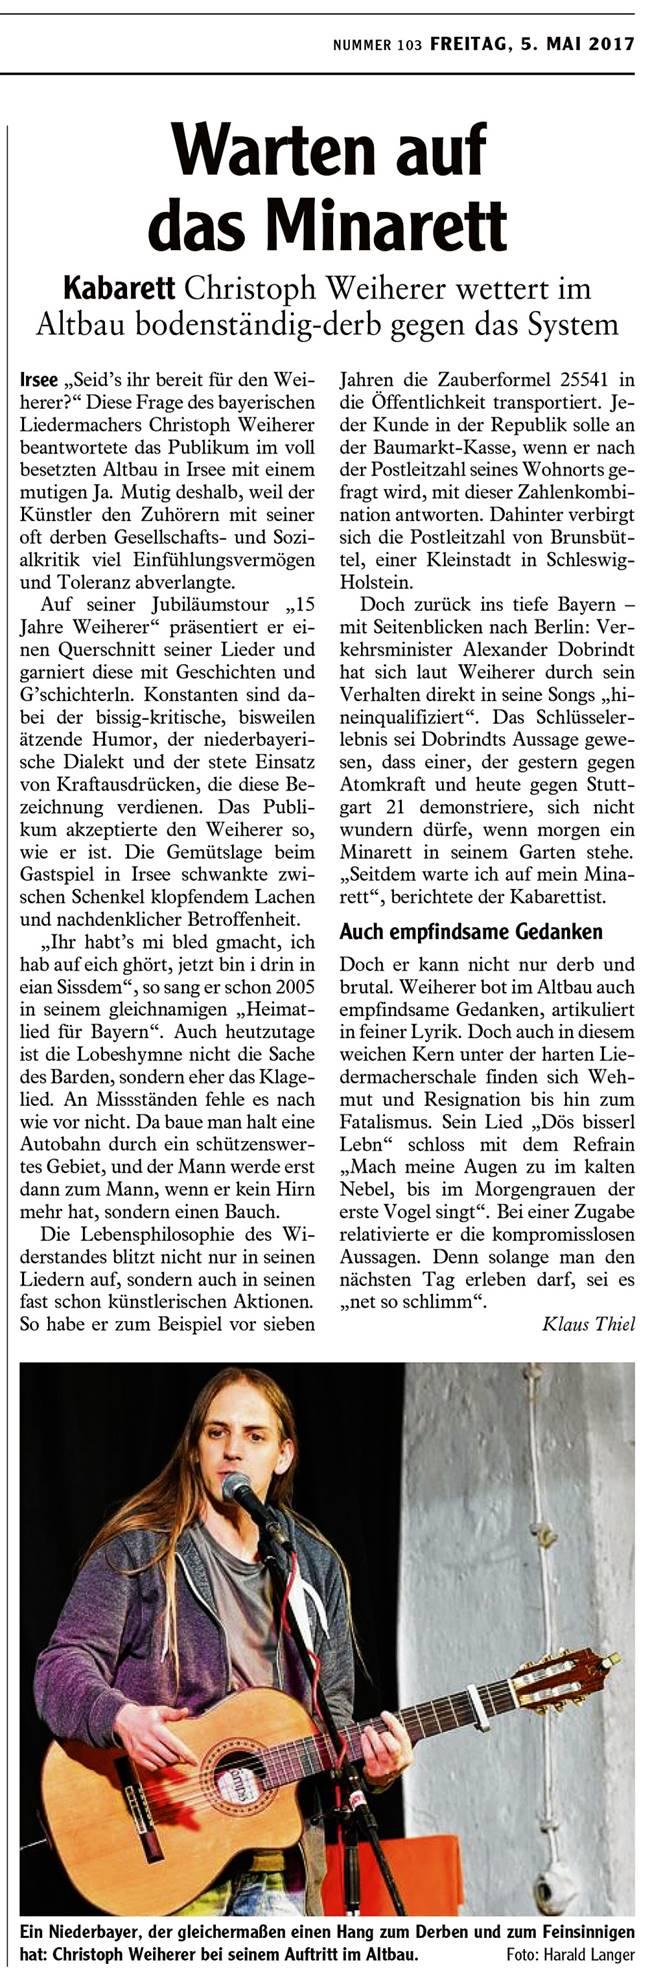 Kleinkunstverein Altbau e.V. - Weiherer